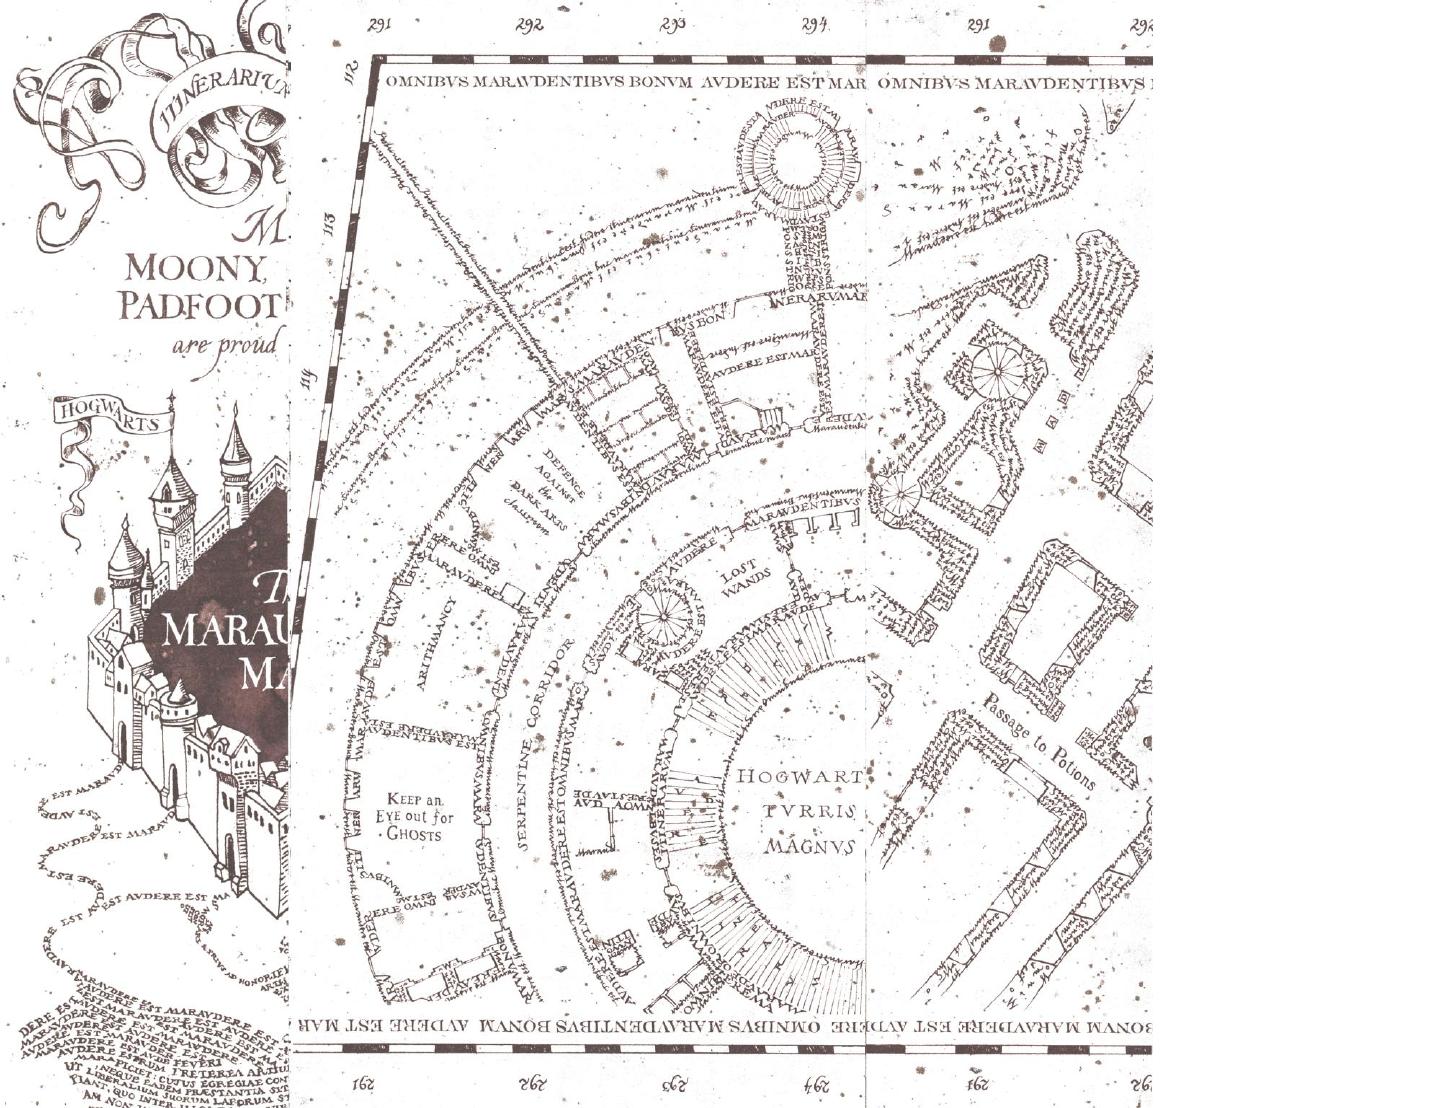 Related Image Marauders Map Map The Marauders